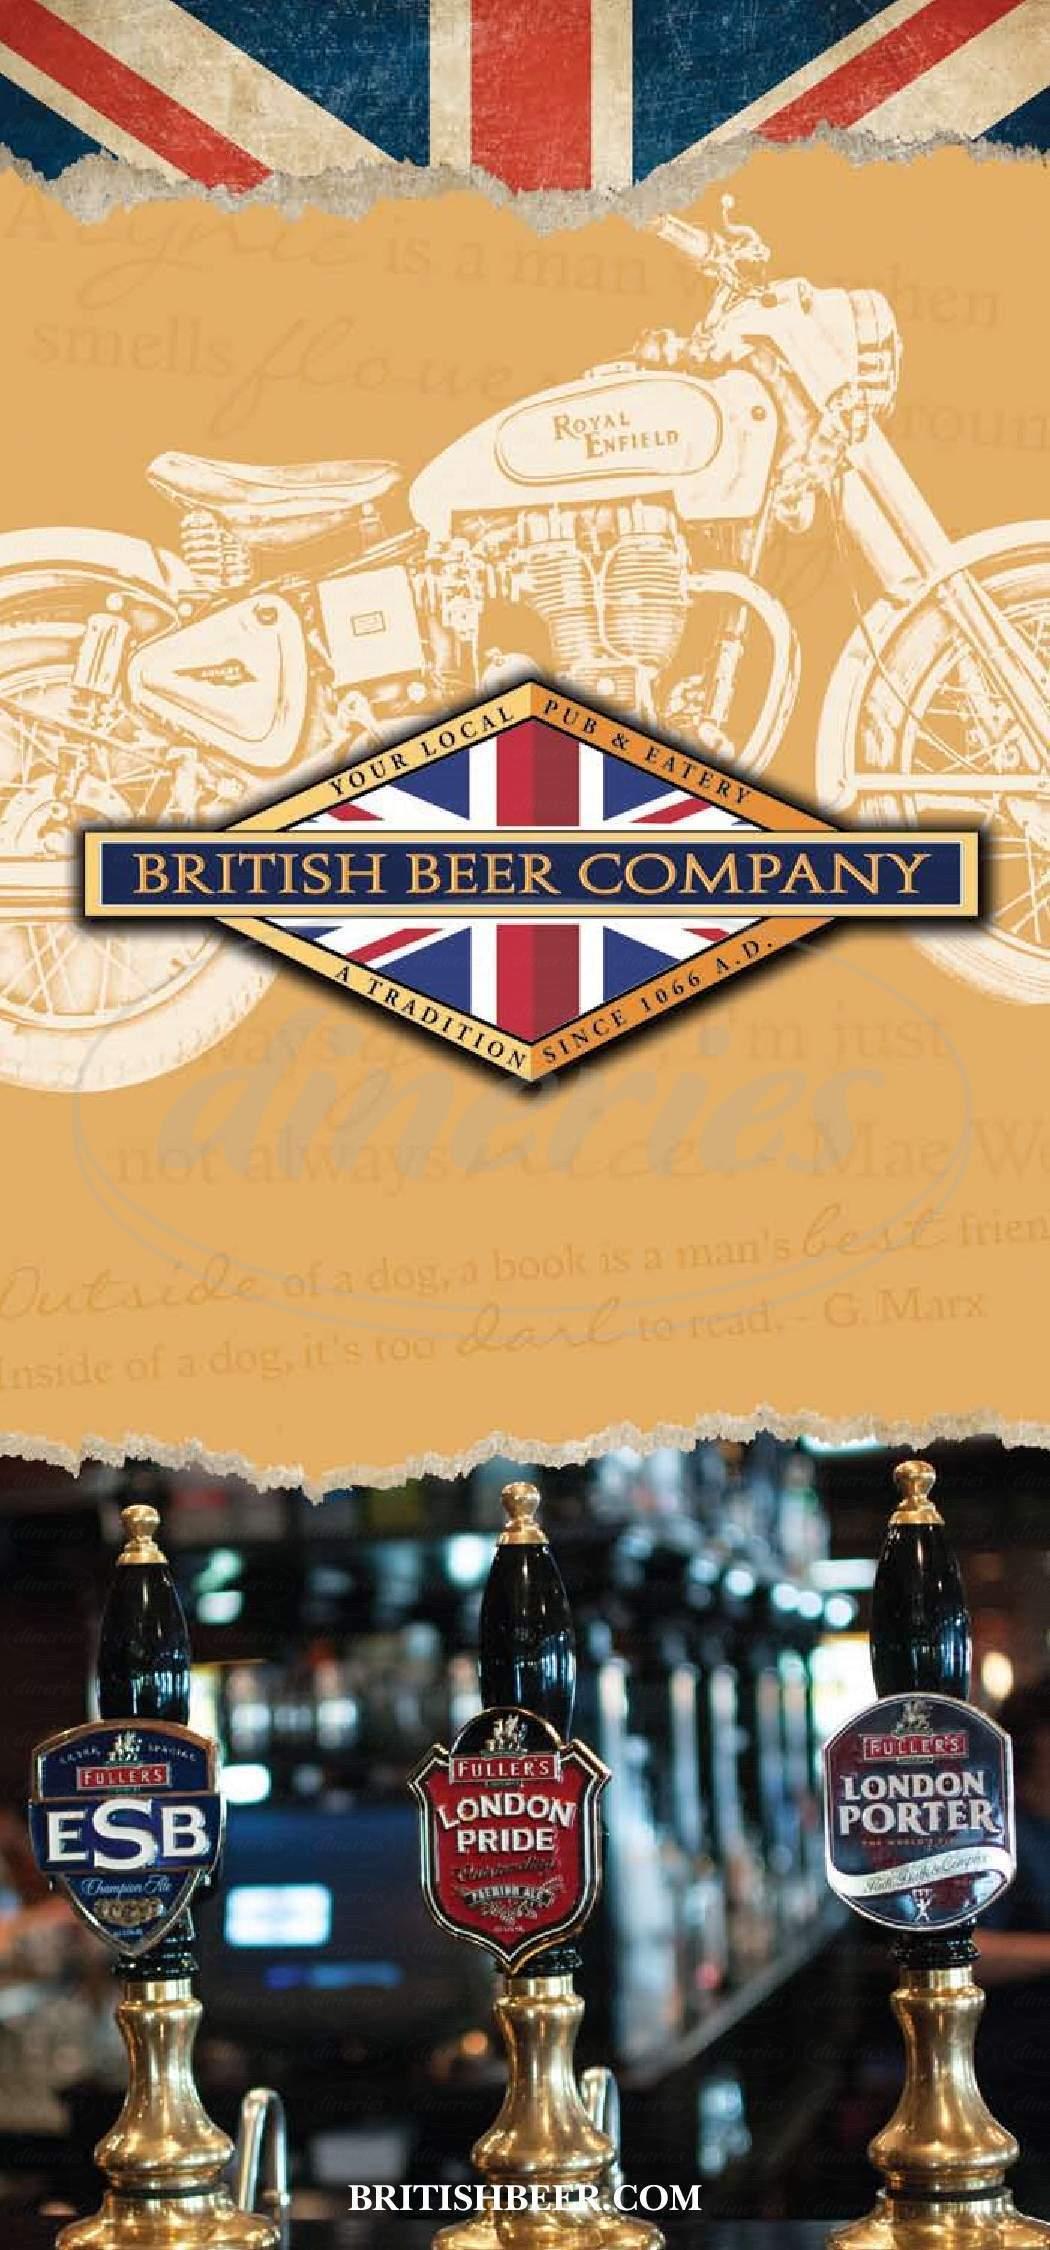 menu for British Beer Company